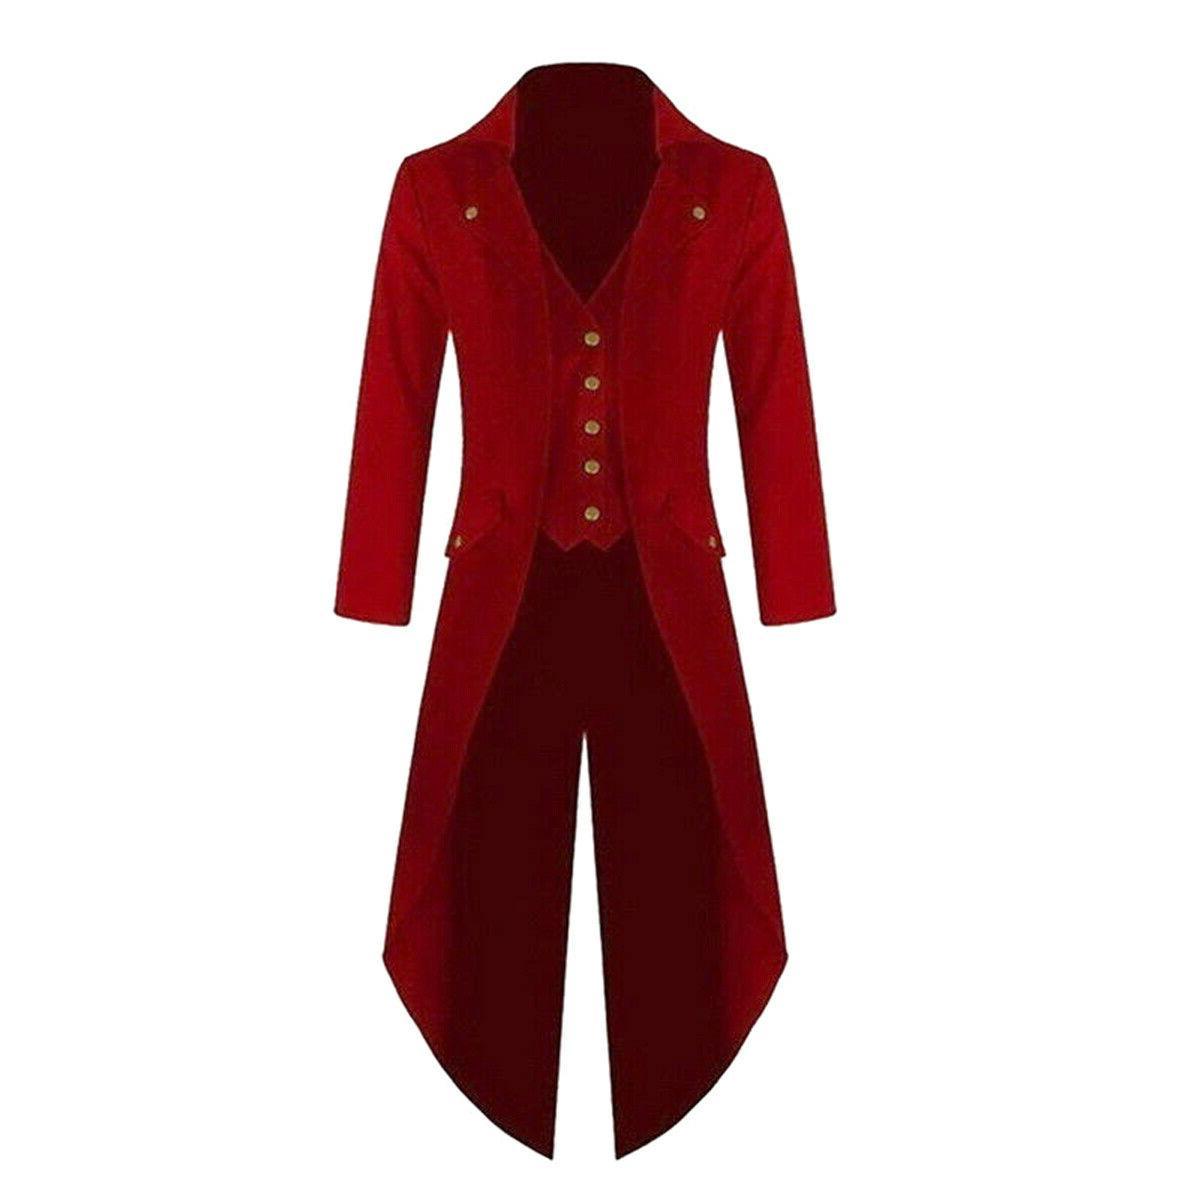 Coat Banquet Tail